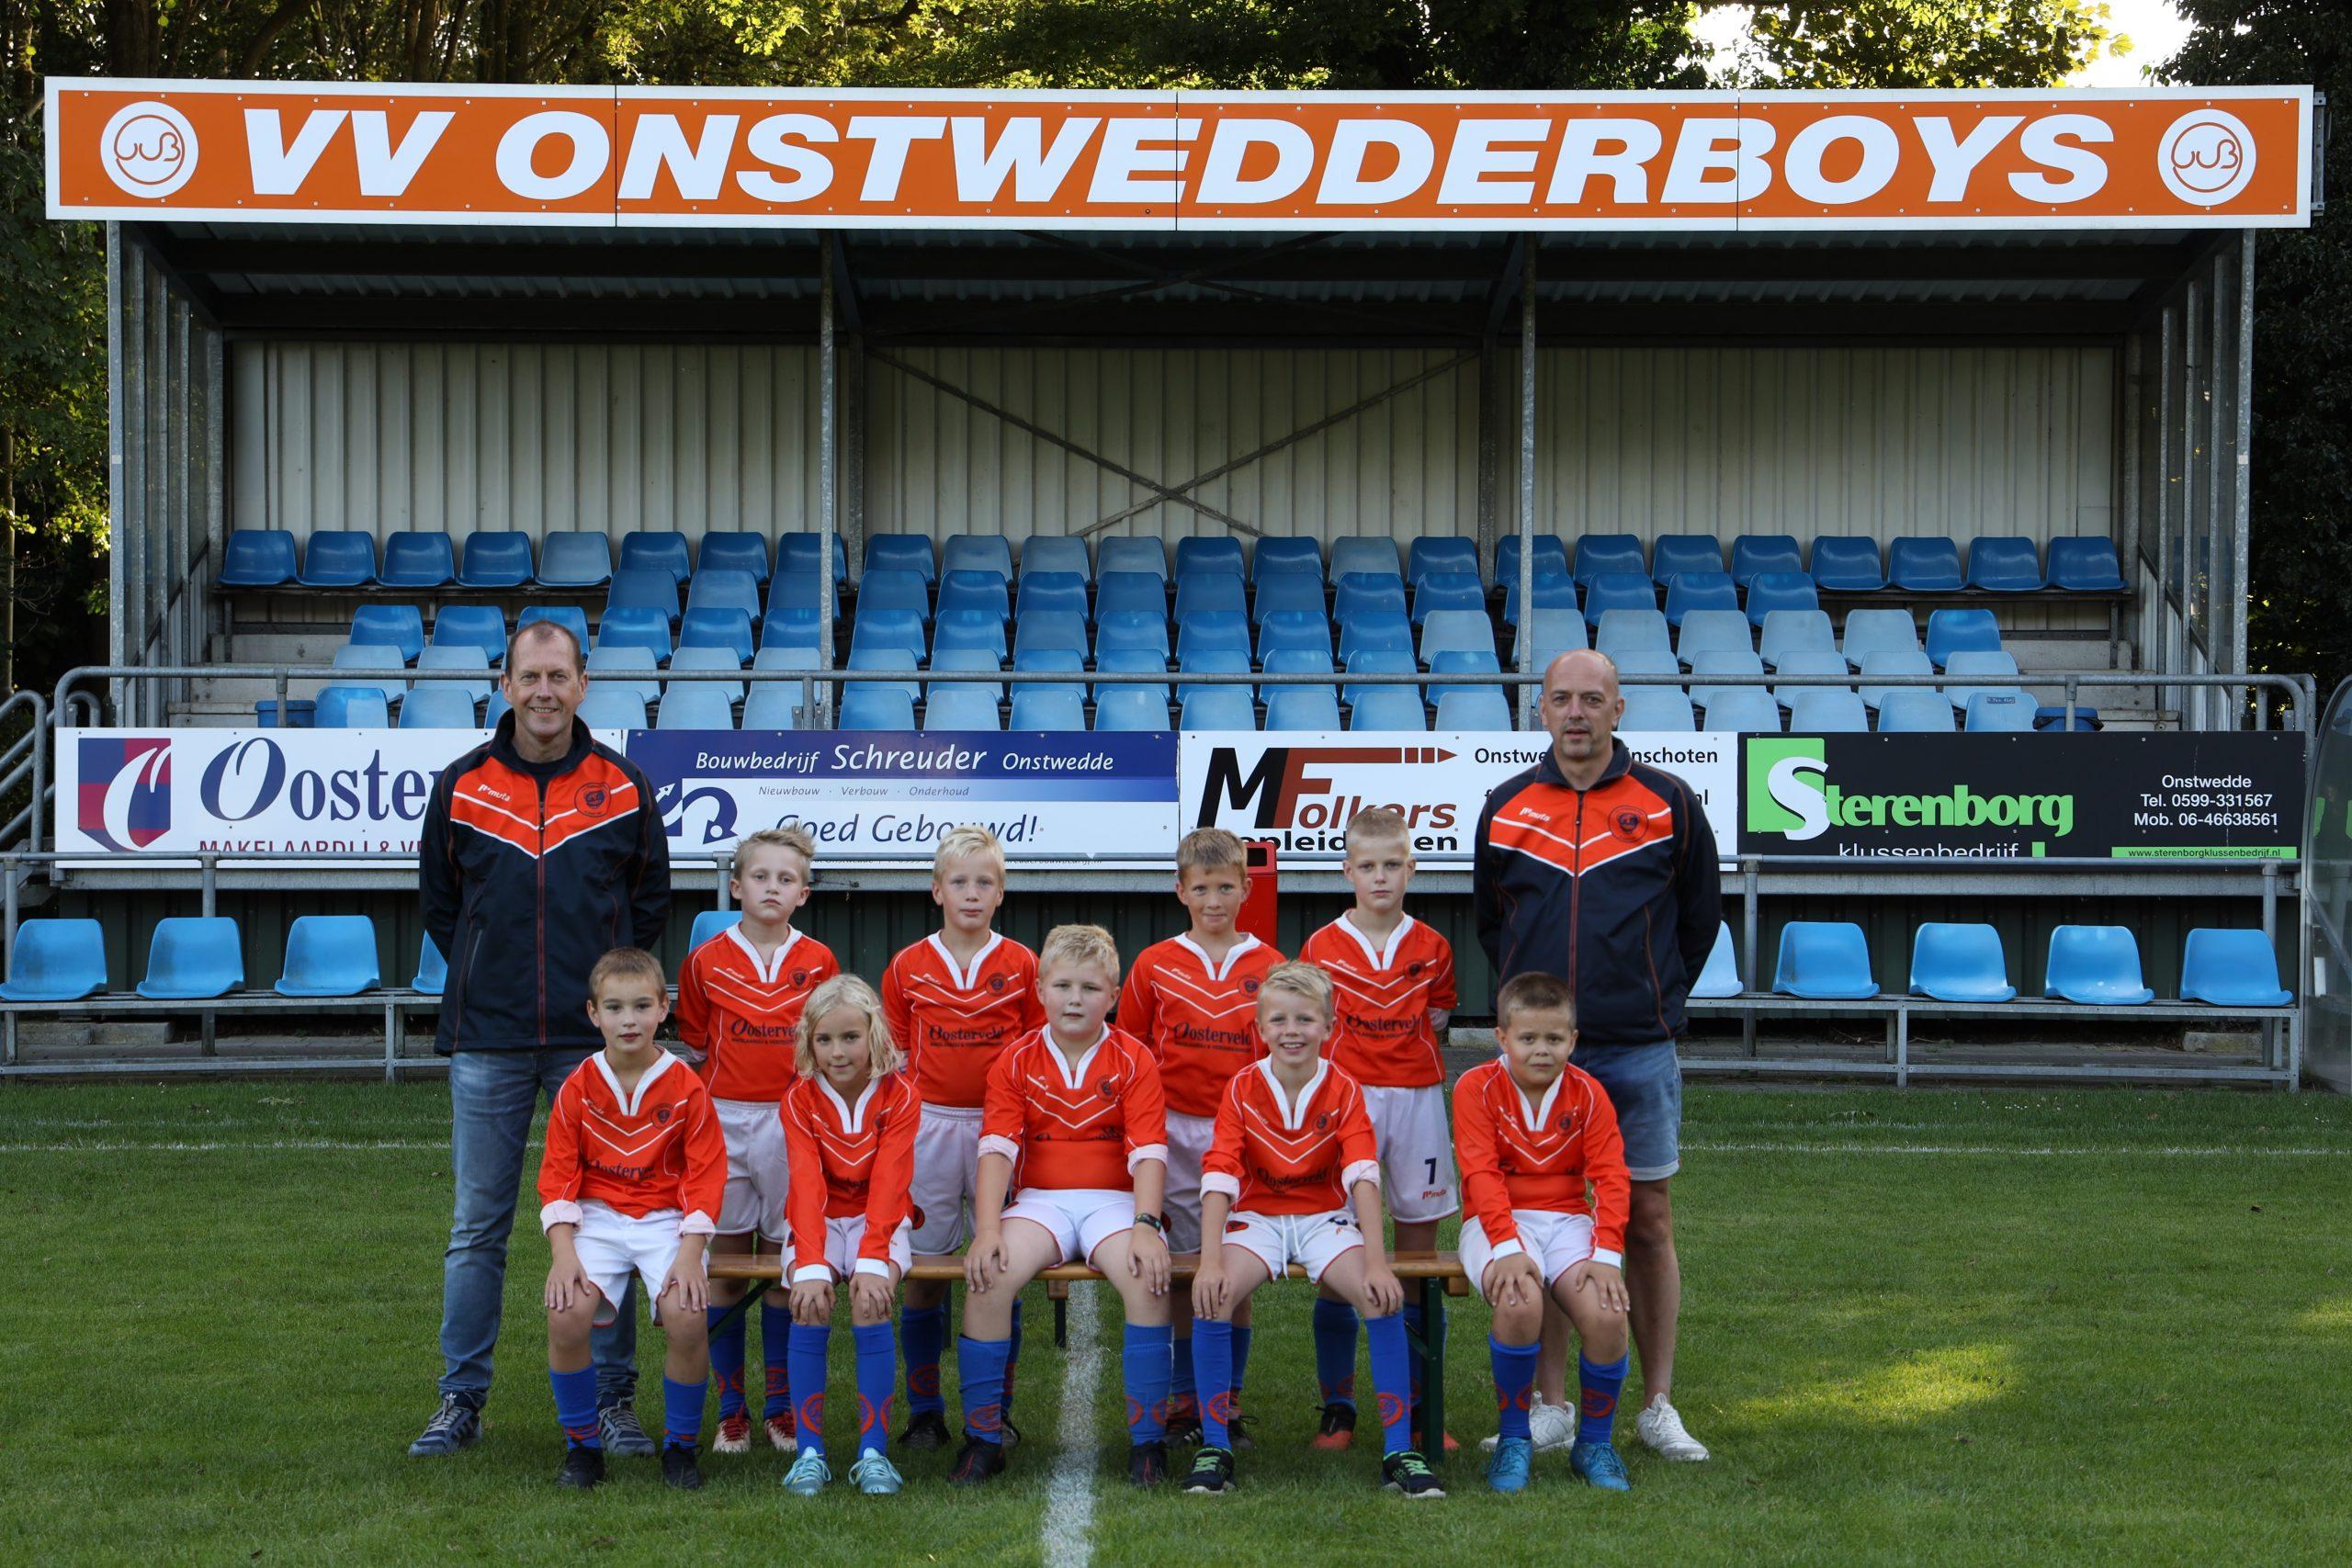 Ónstwedder Boys JO10-2 2021-2022